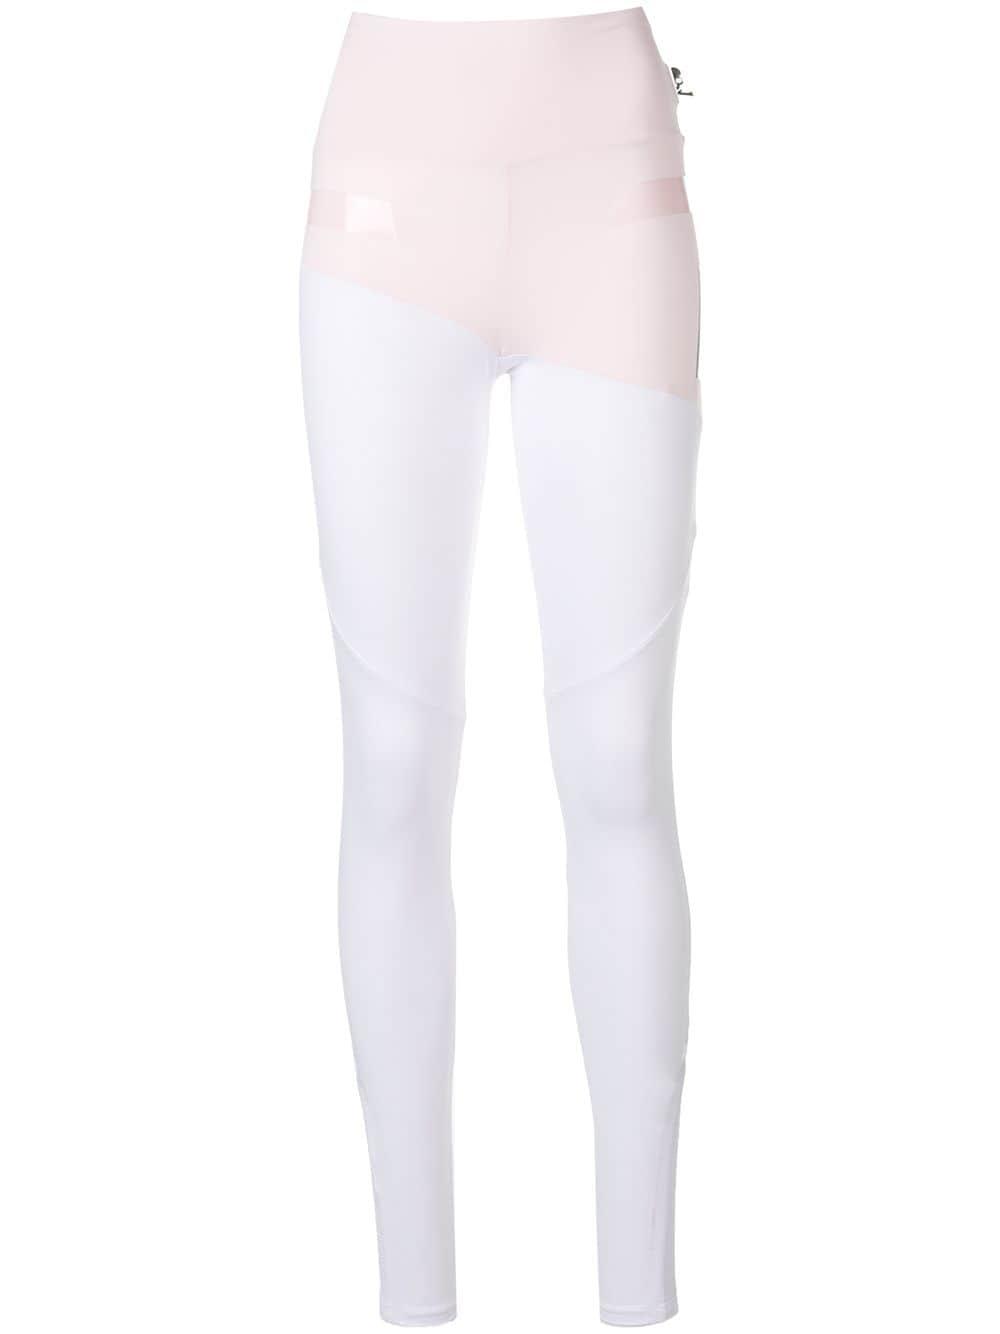 8a89d13c6e Philipp Plein logo active leggings - Pink - Glami.hu